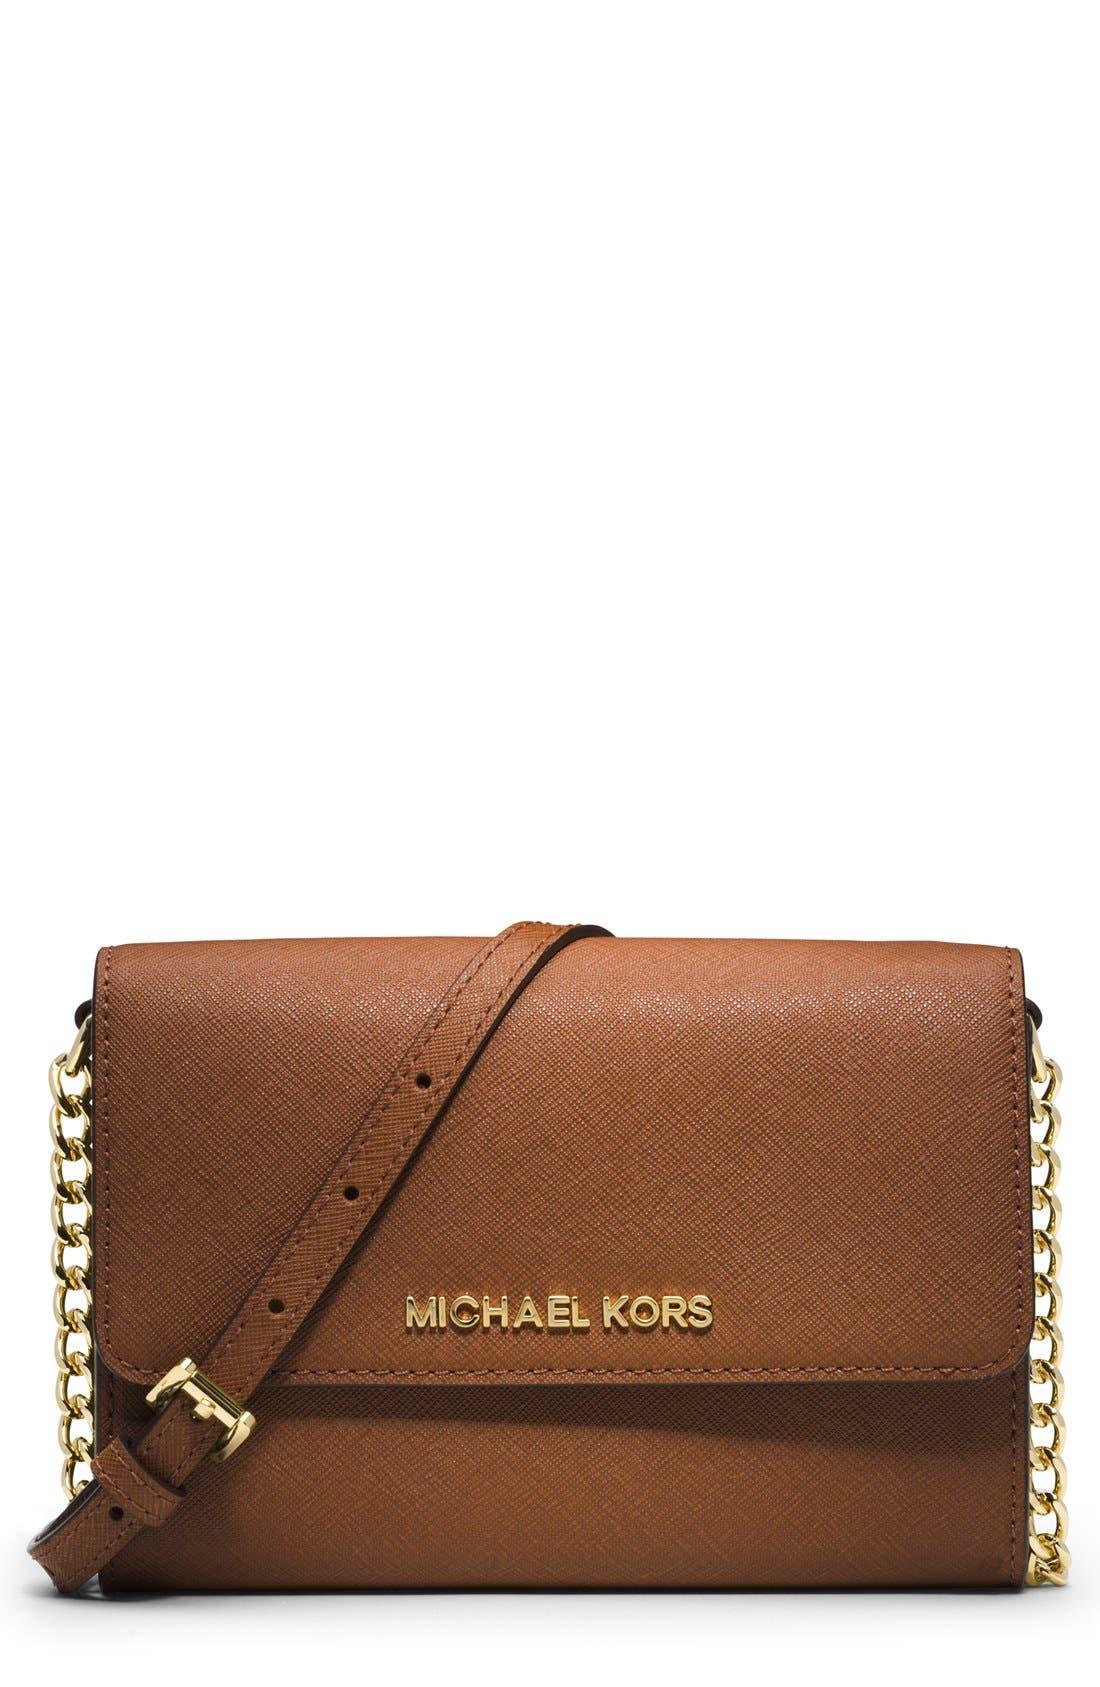 Alternate Image 1 Selected - MICHAEL Michael Kors 'Jet Set - Large Phone' Saffiano Leather Crossbody Bag